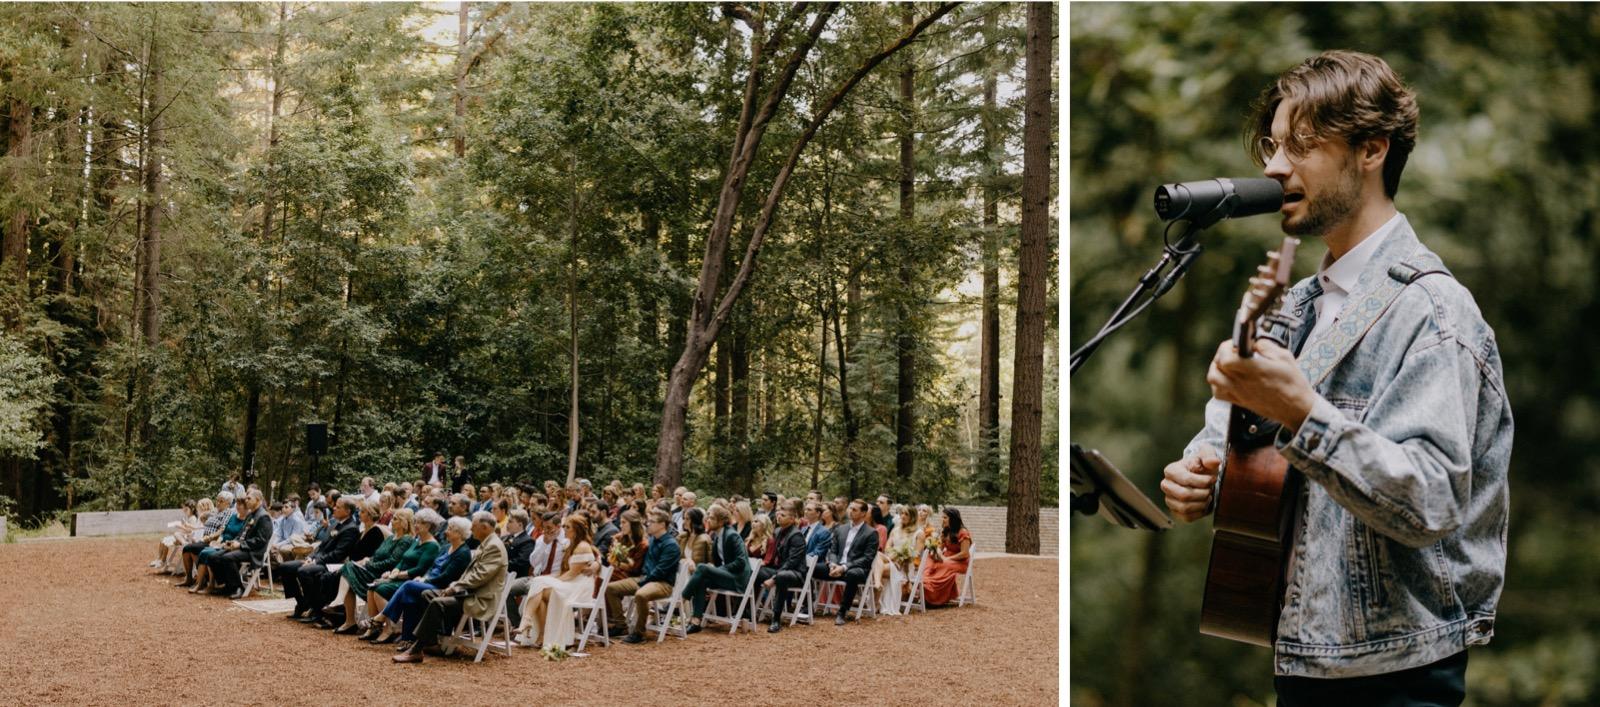 070_Emily & Jeff Wedding 0675_Emily & Jeff Wedding 0666_the-waterfall-lodge_forest_wedding_ben-lomond_intimate